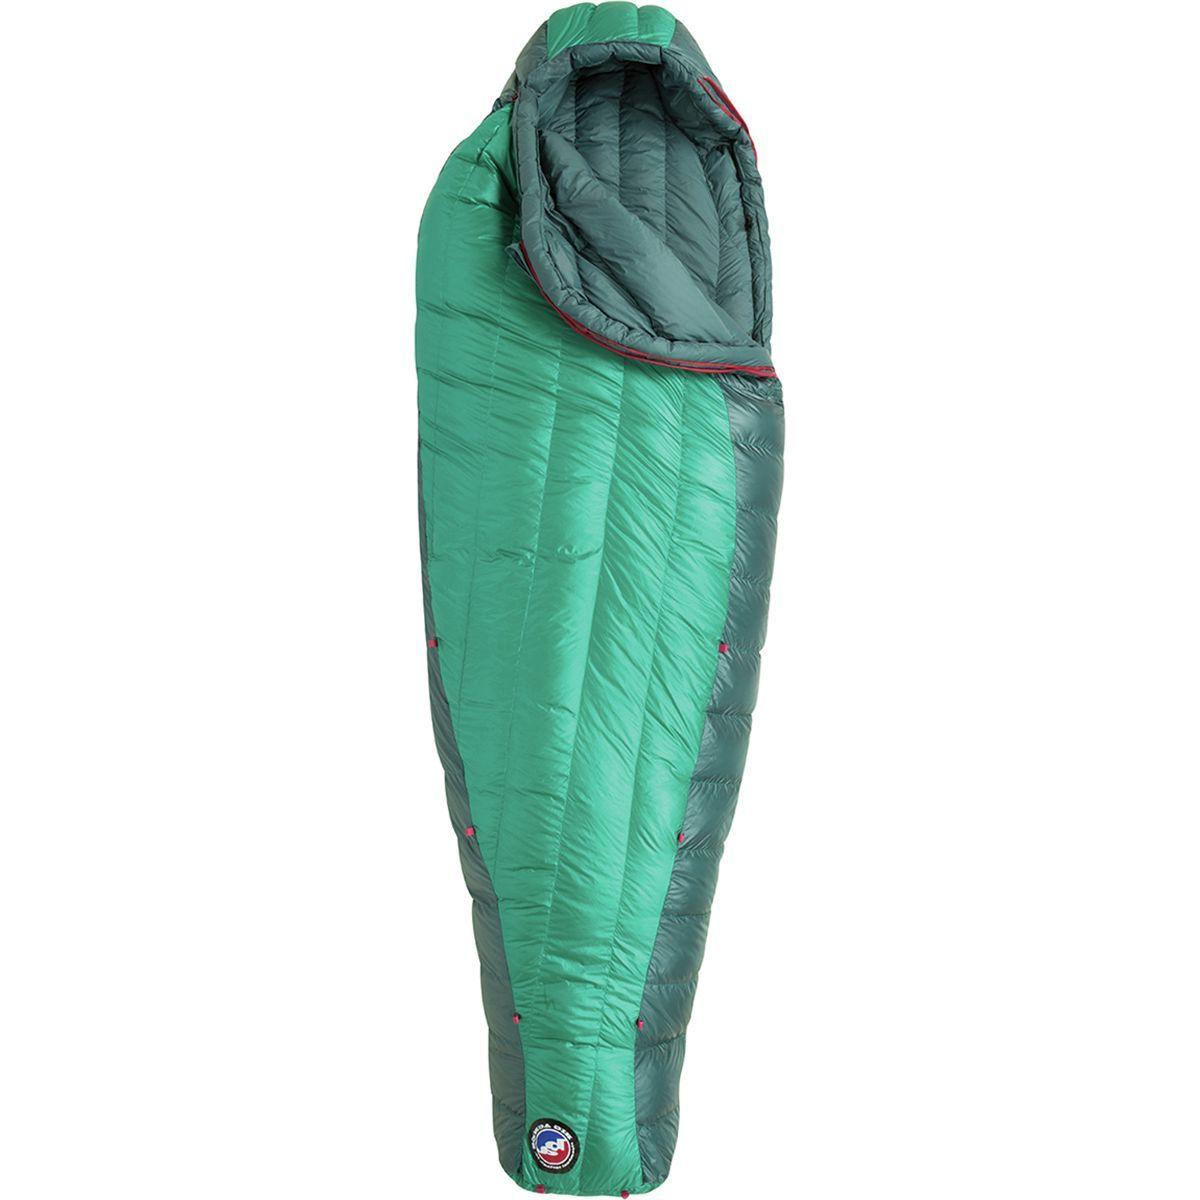 Big Agnes Sidney SL Sleeping Bag: 25 Degree Down - Women's